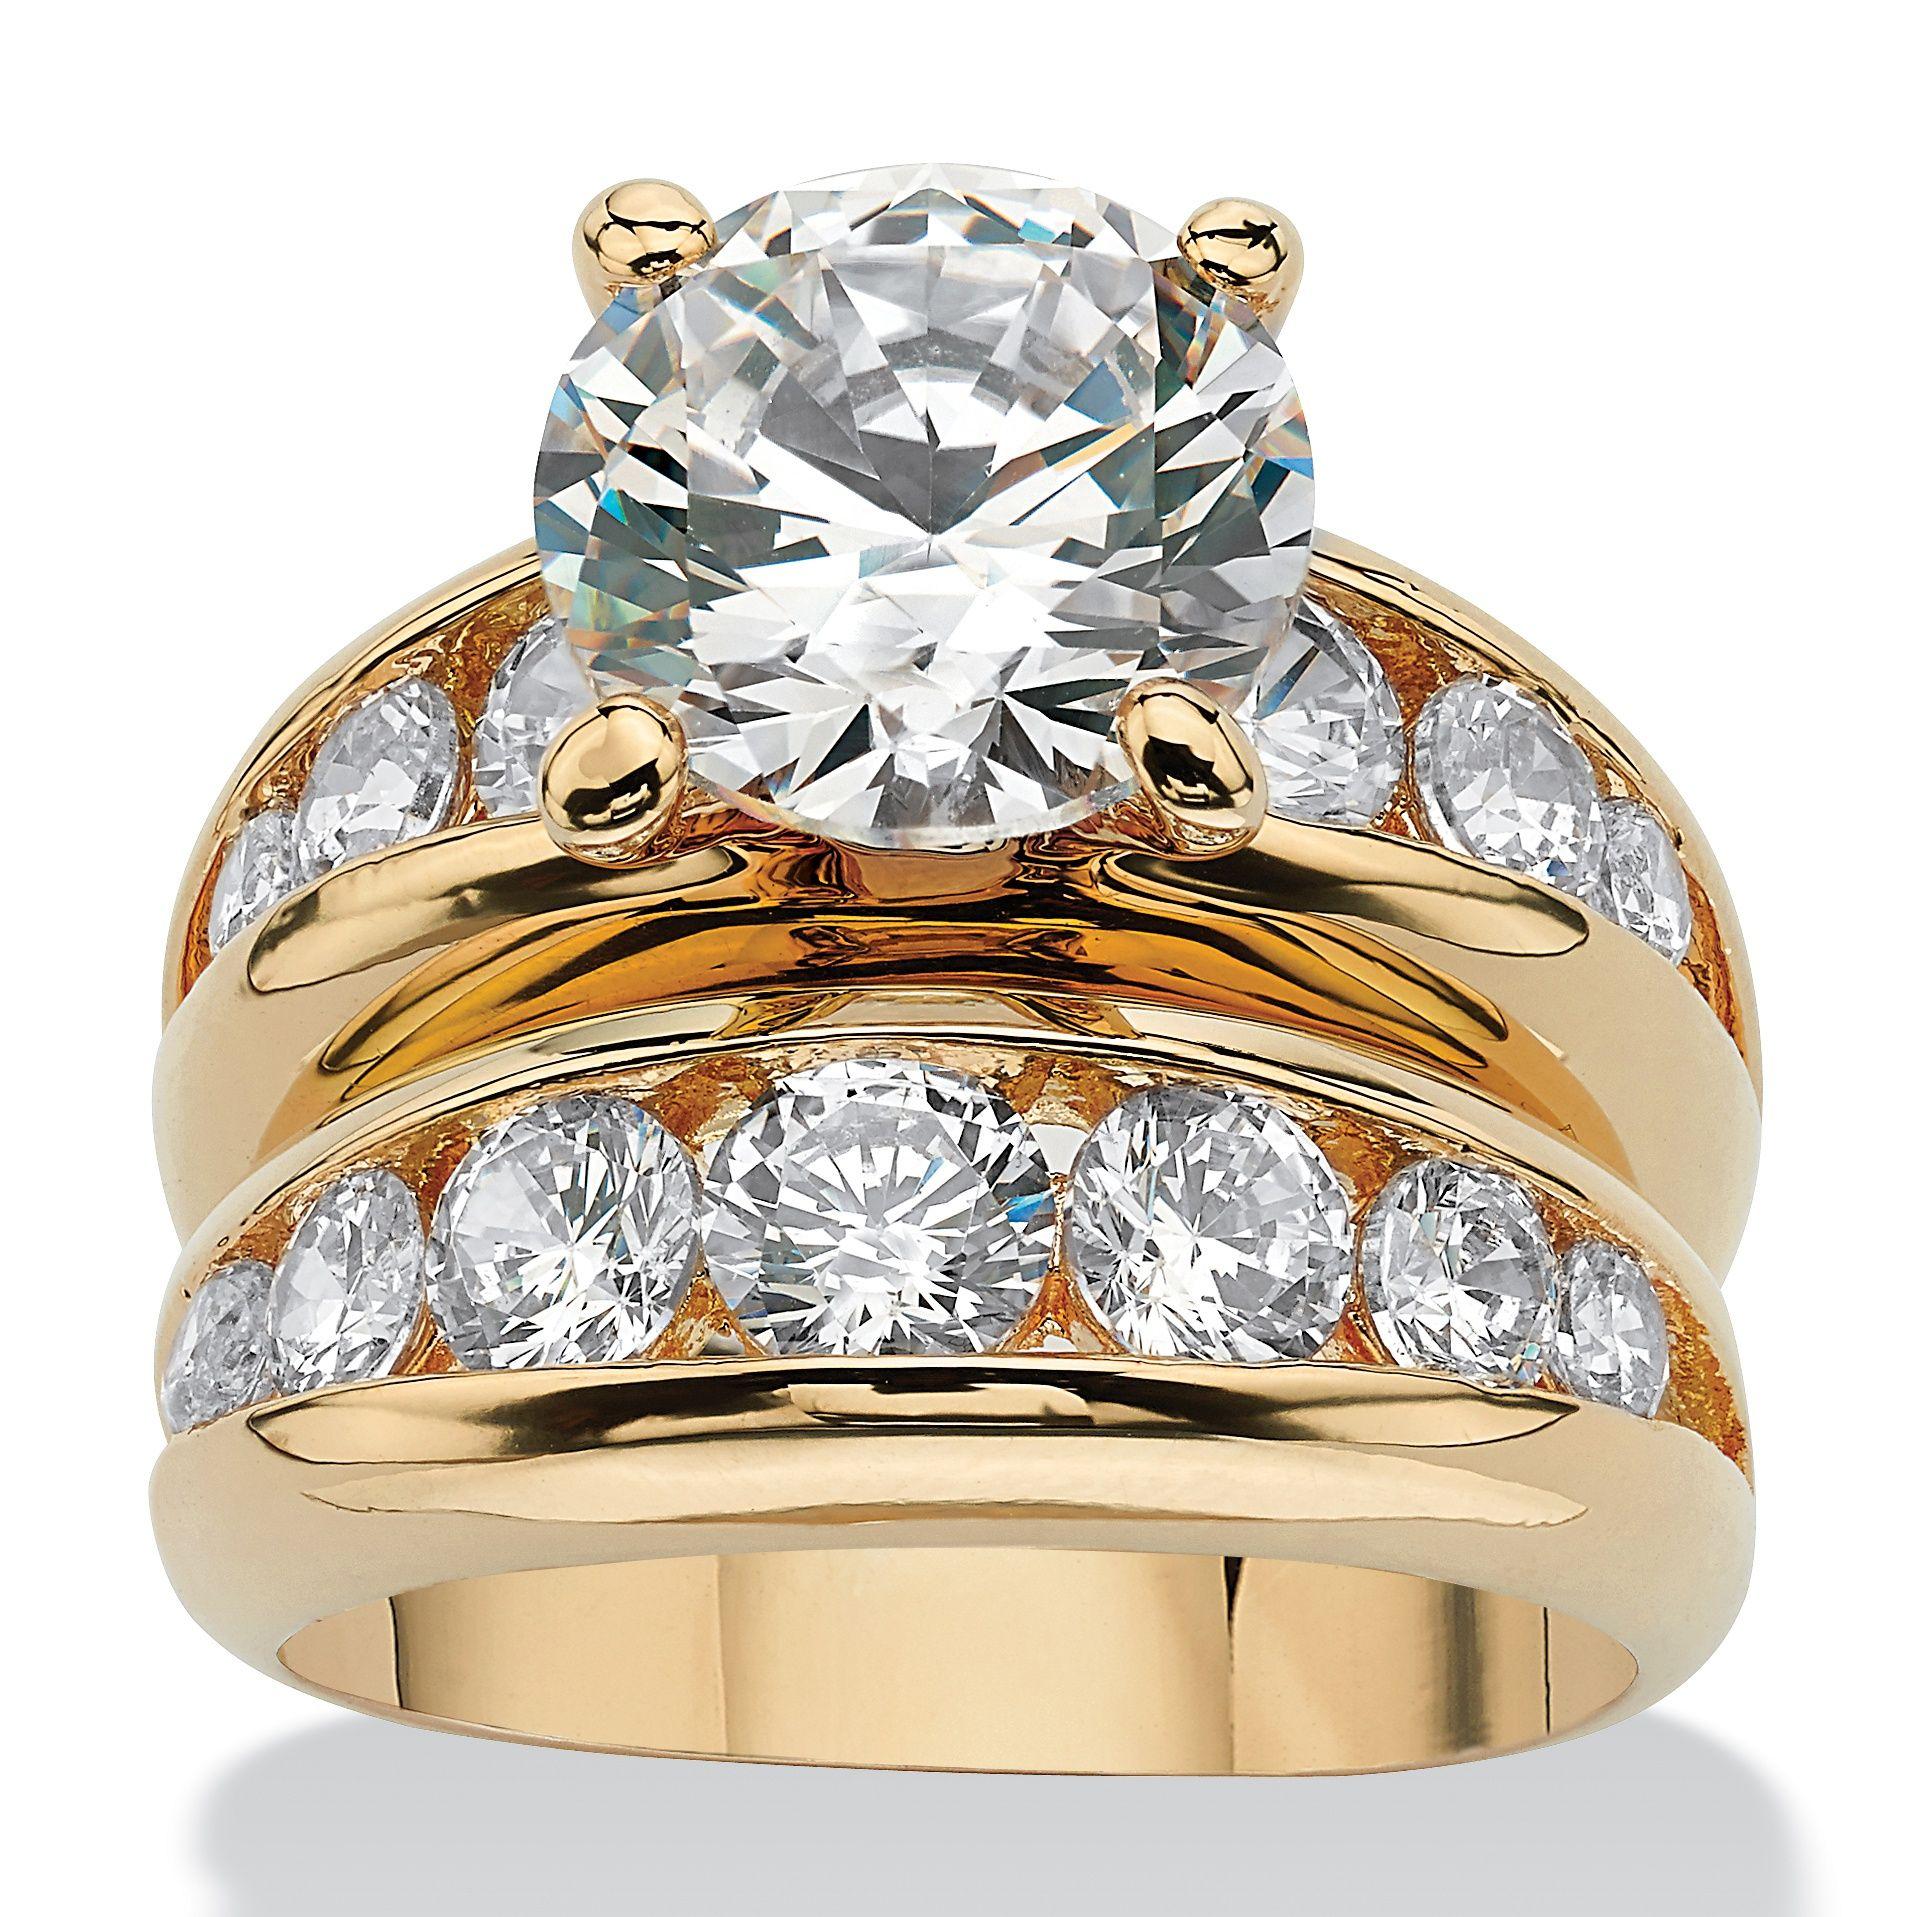 Possessing 6.09 carats T.W. of megawatt sparkle, this